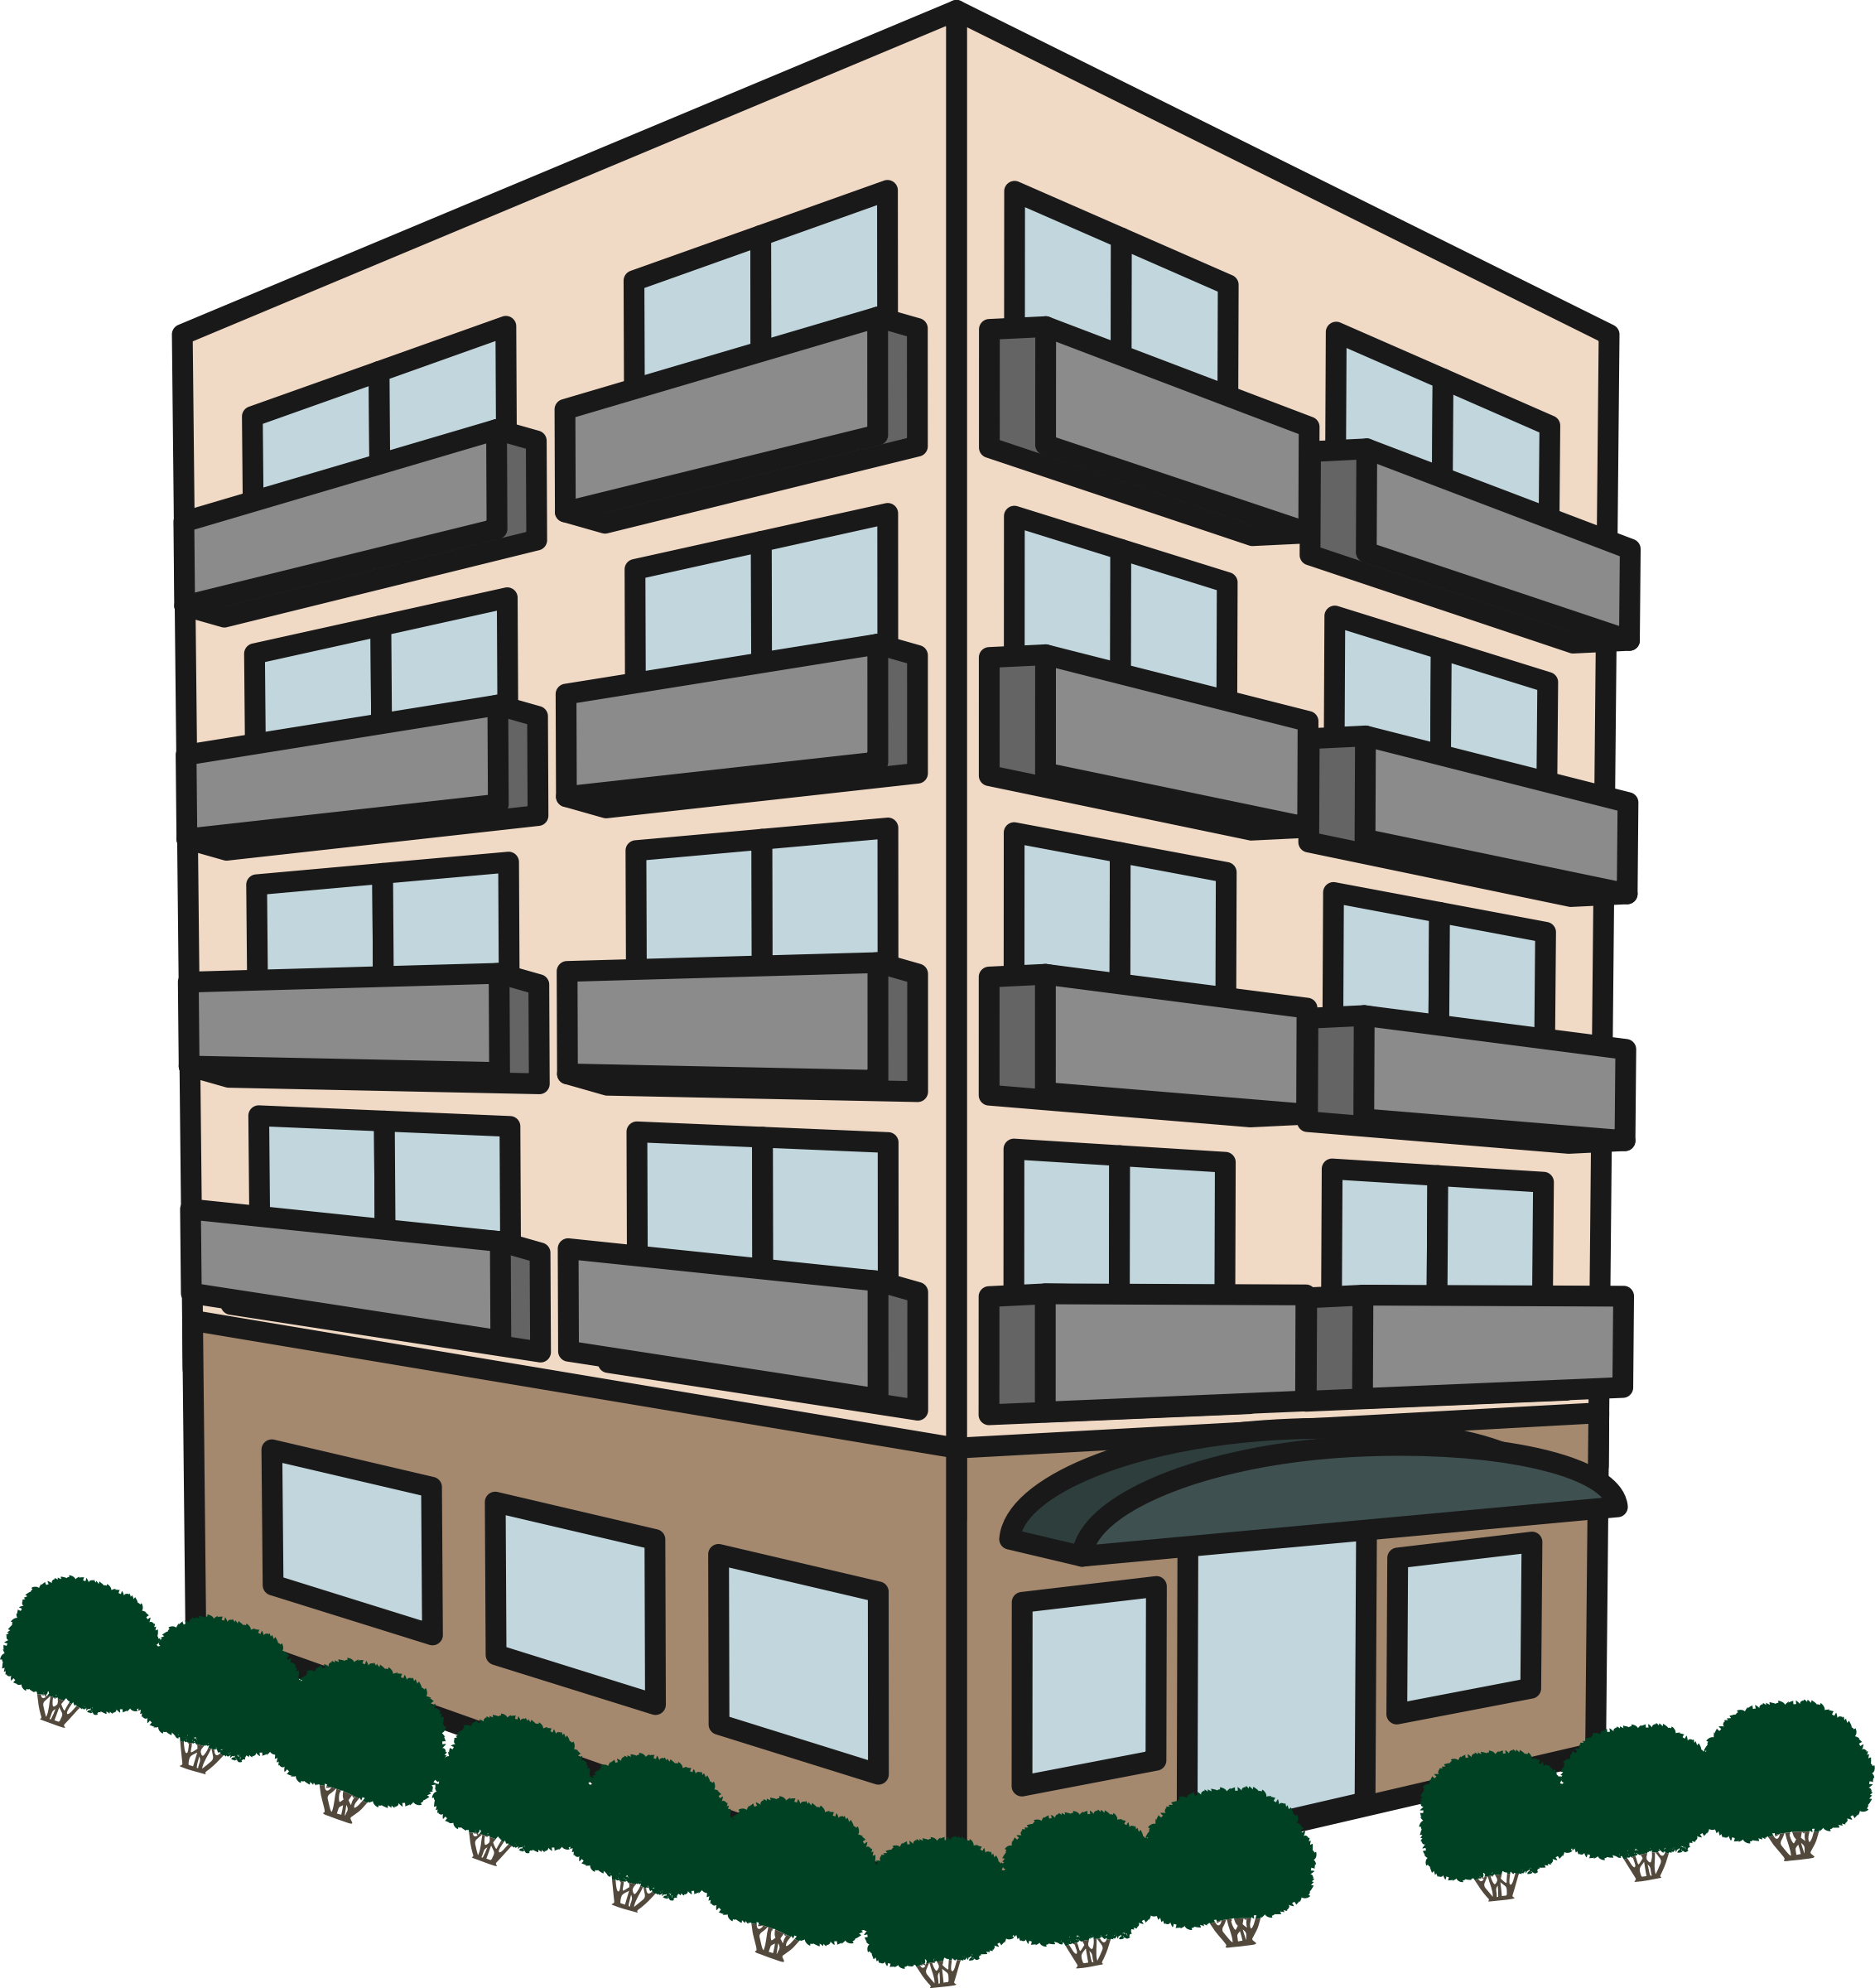 Apartment block clipart vector freeuse Apartment Building Clipart | Free download best Apartment Building ... vector freeuse